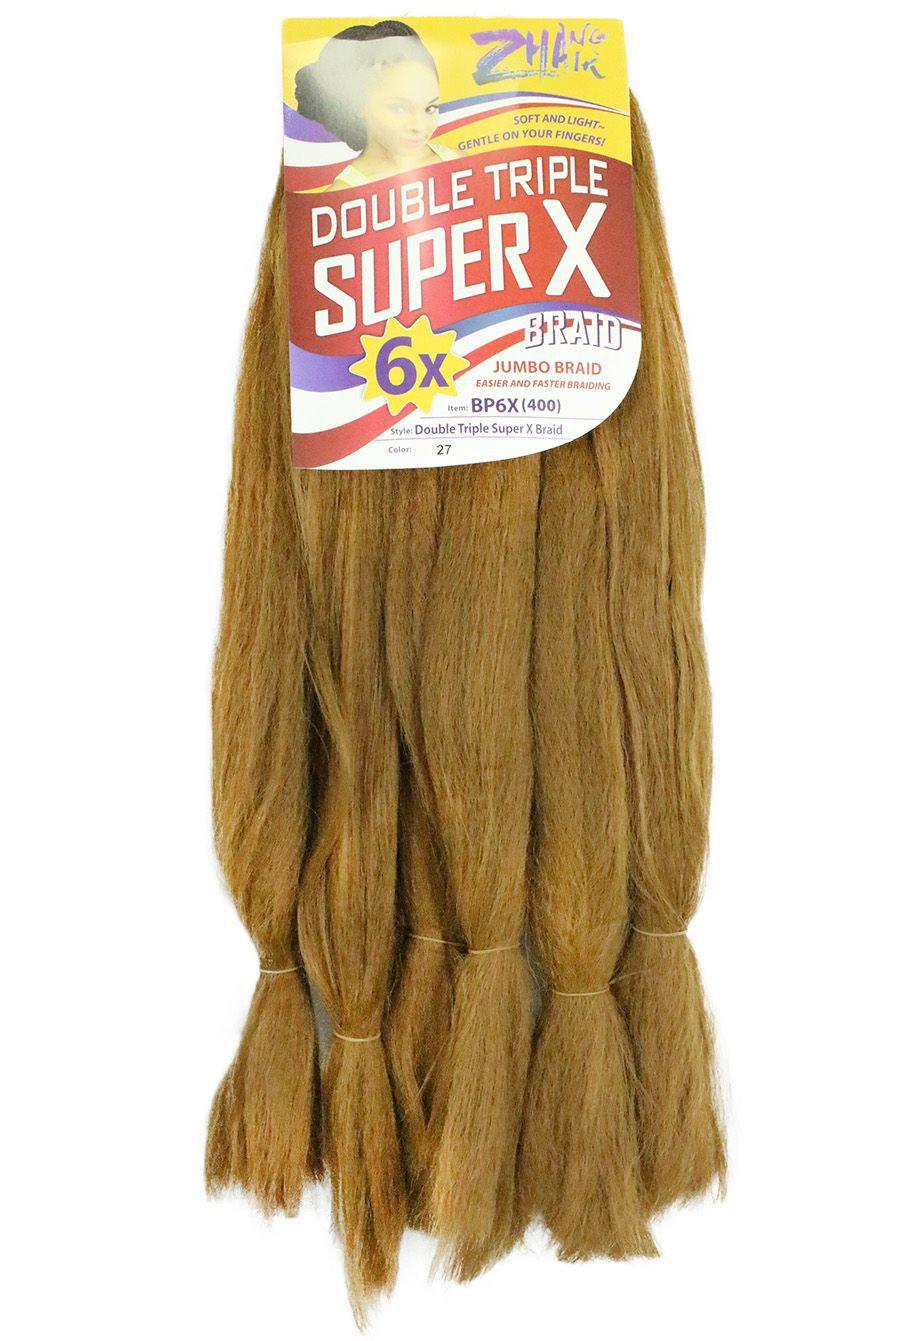 Cabelo Sintético - Zhang hair jumbo - Super X (400g) - Cor: Mel (27)